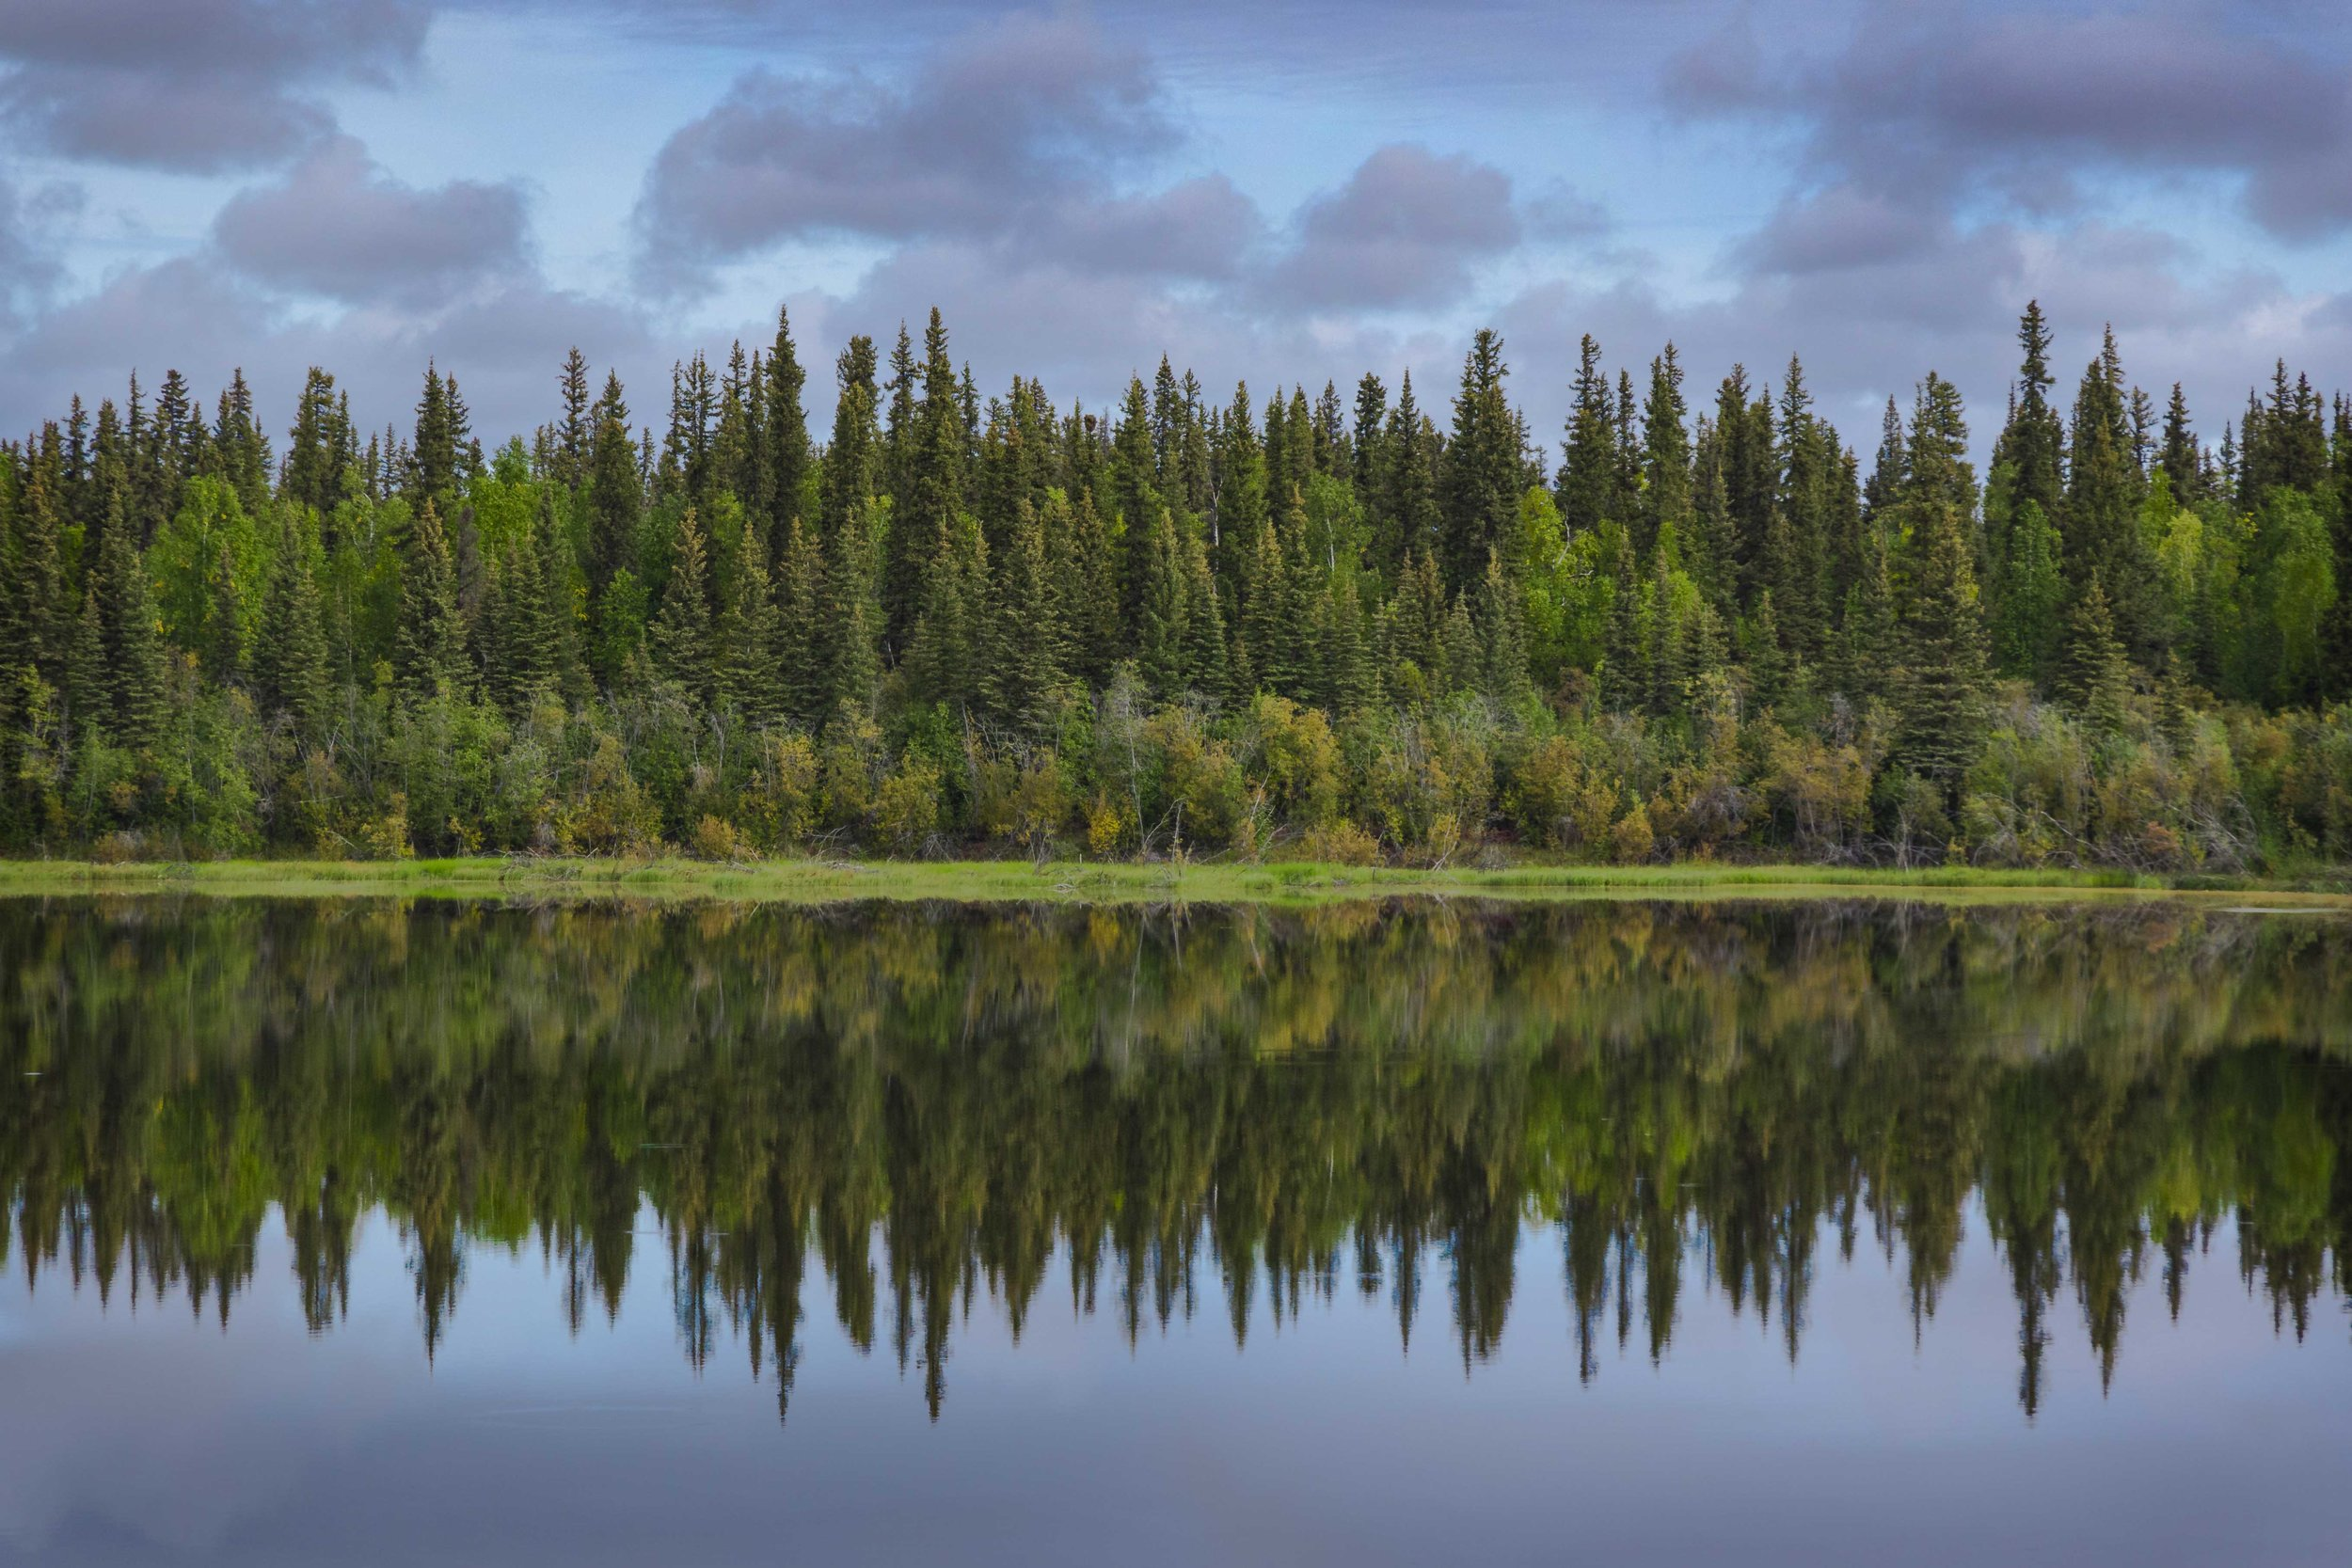 Dempster Highway, Roadtrip, Landscape, Arctic, rob gubiani, Tundra, Tombstone, Tuktoyuktuk, Inuvik, Dempster, Yukon, travel, wanderlust, boreal, forest, boreal forest reflection, mirror, lake,